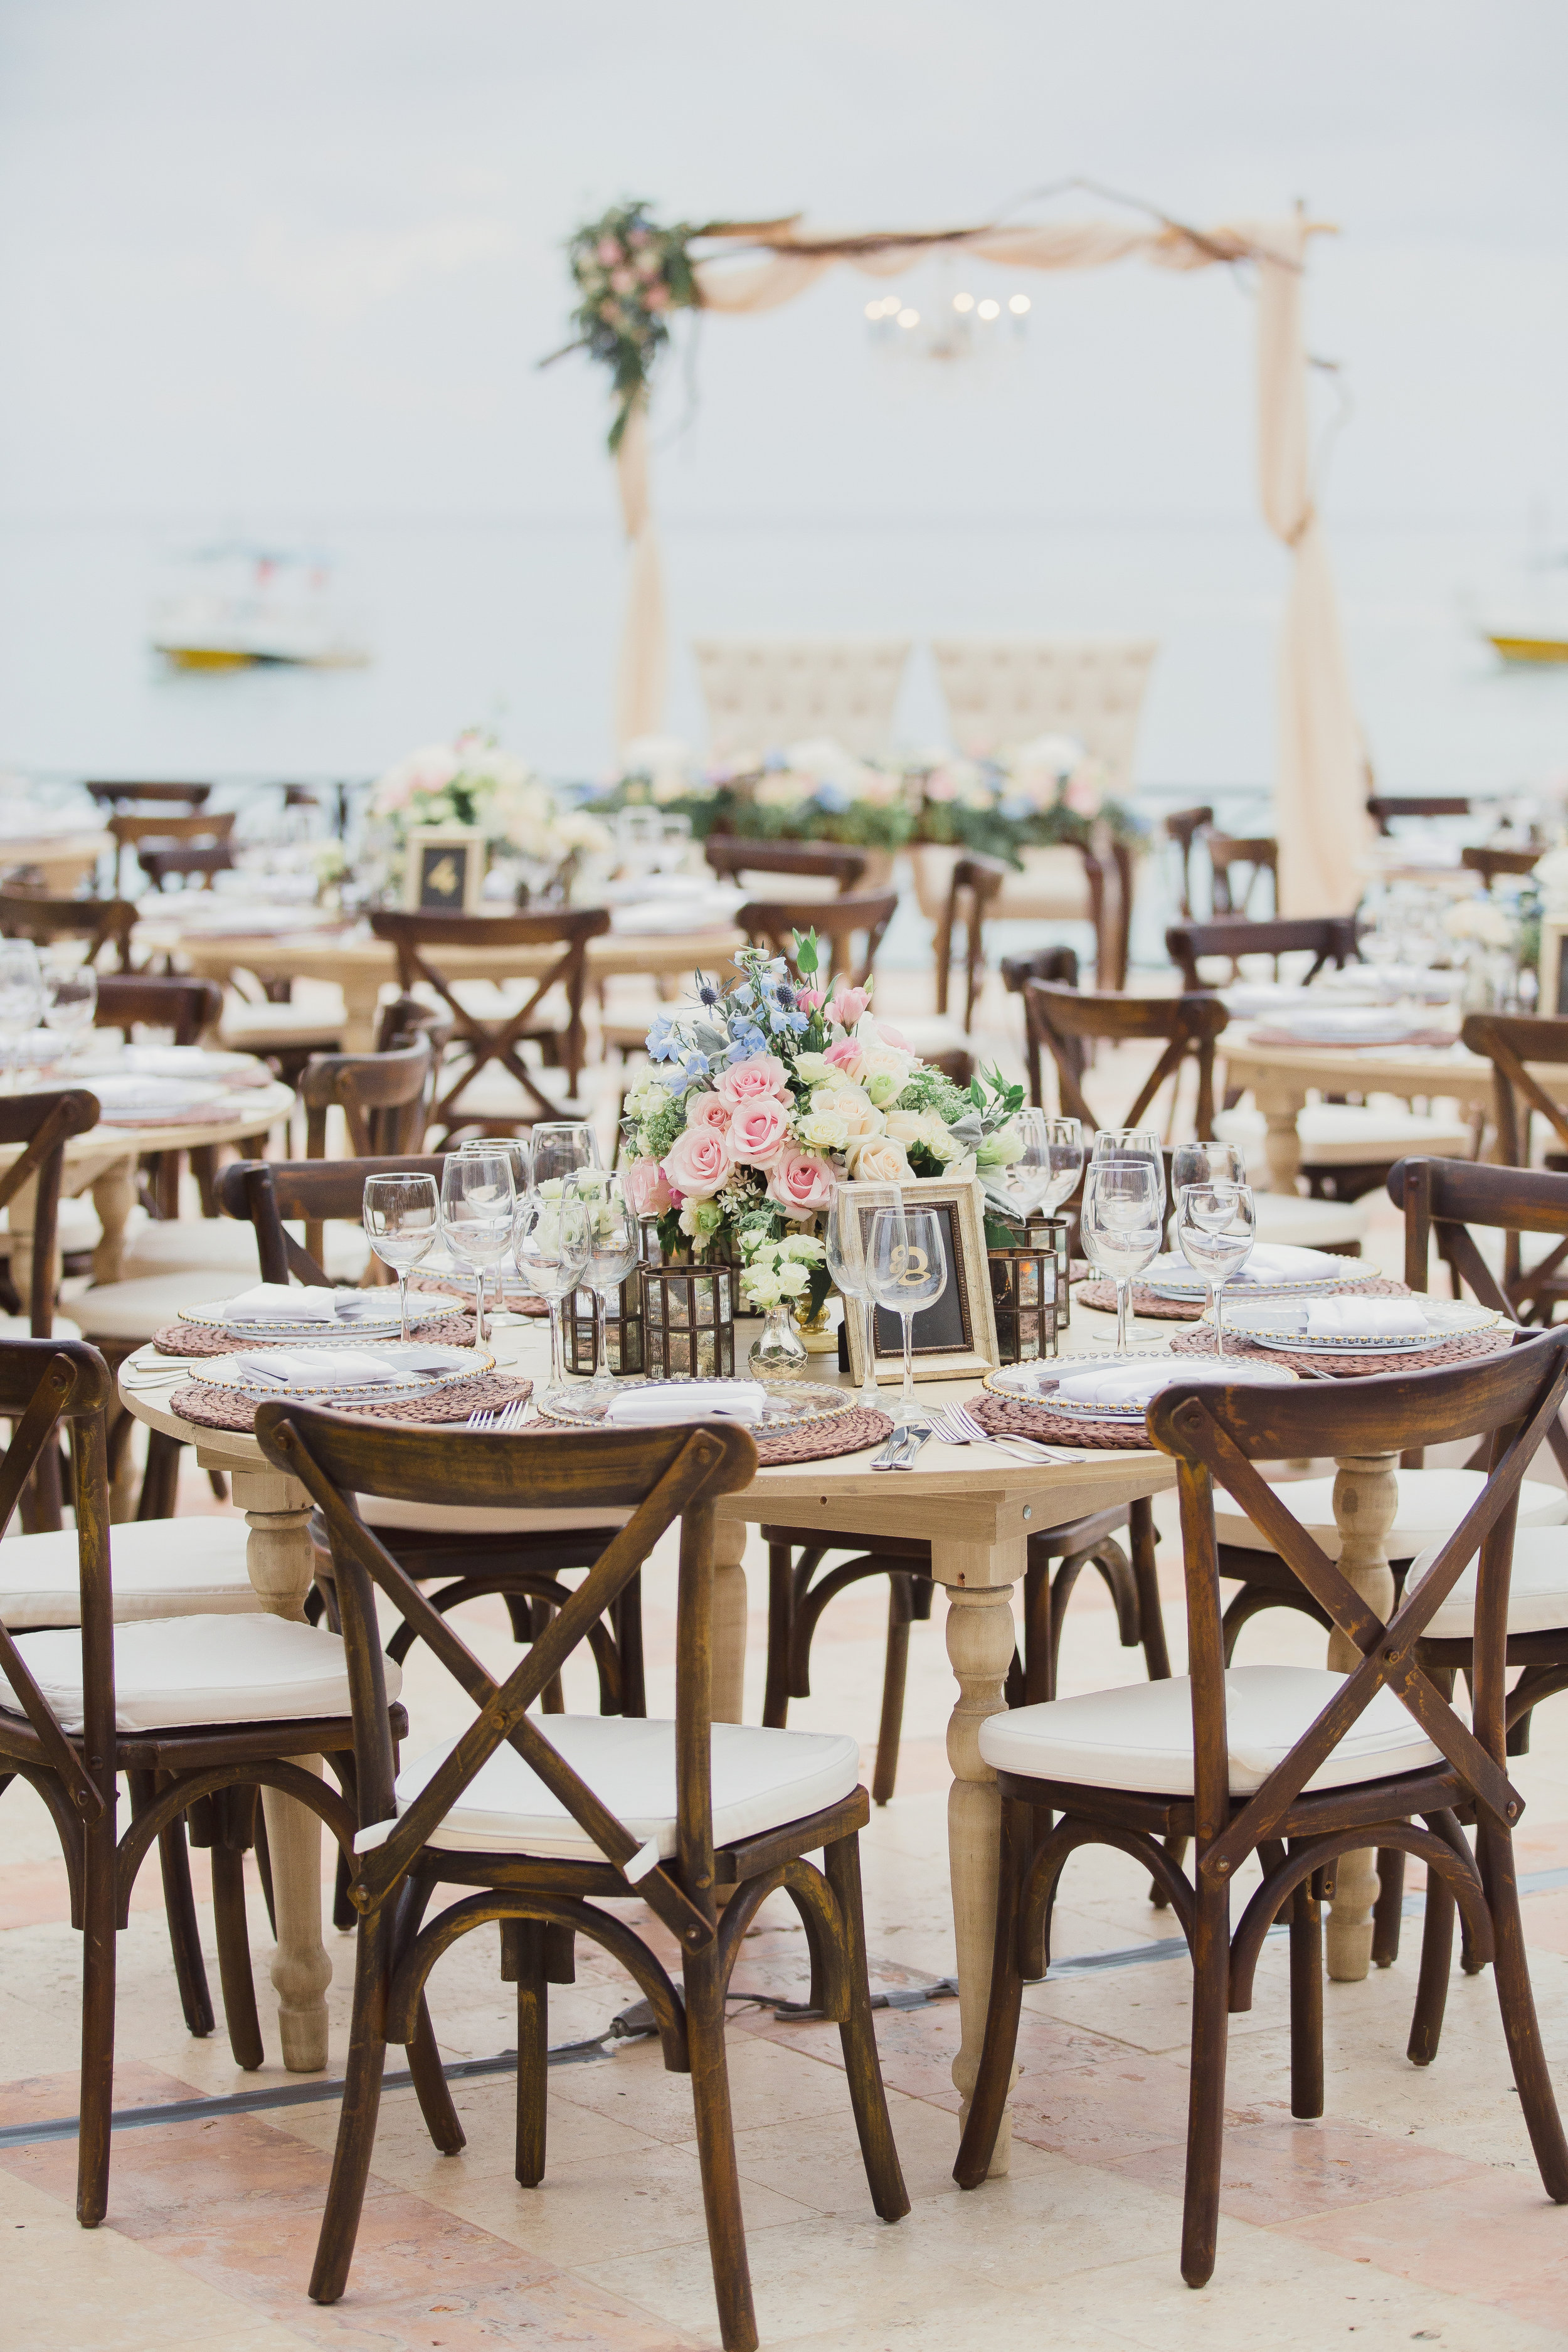 cancun-wedding-venue-villa-la-joya-67.jpg